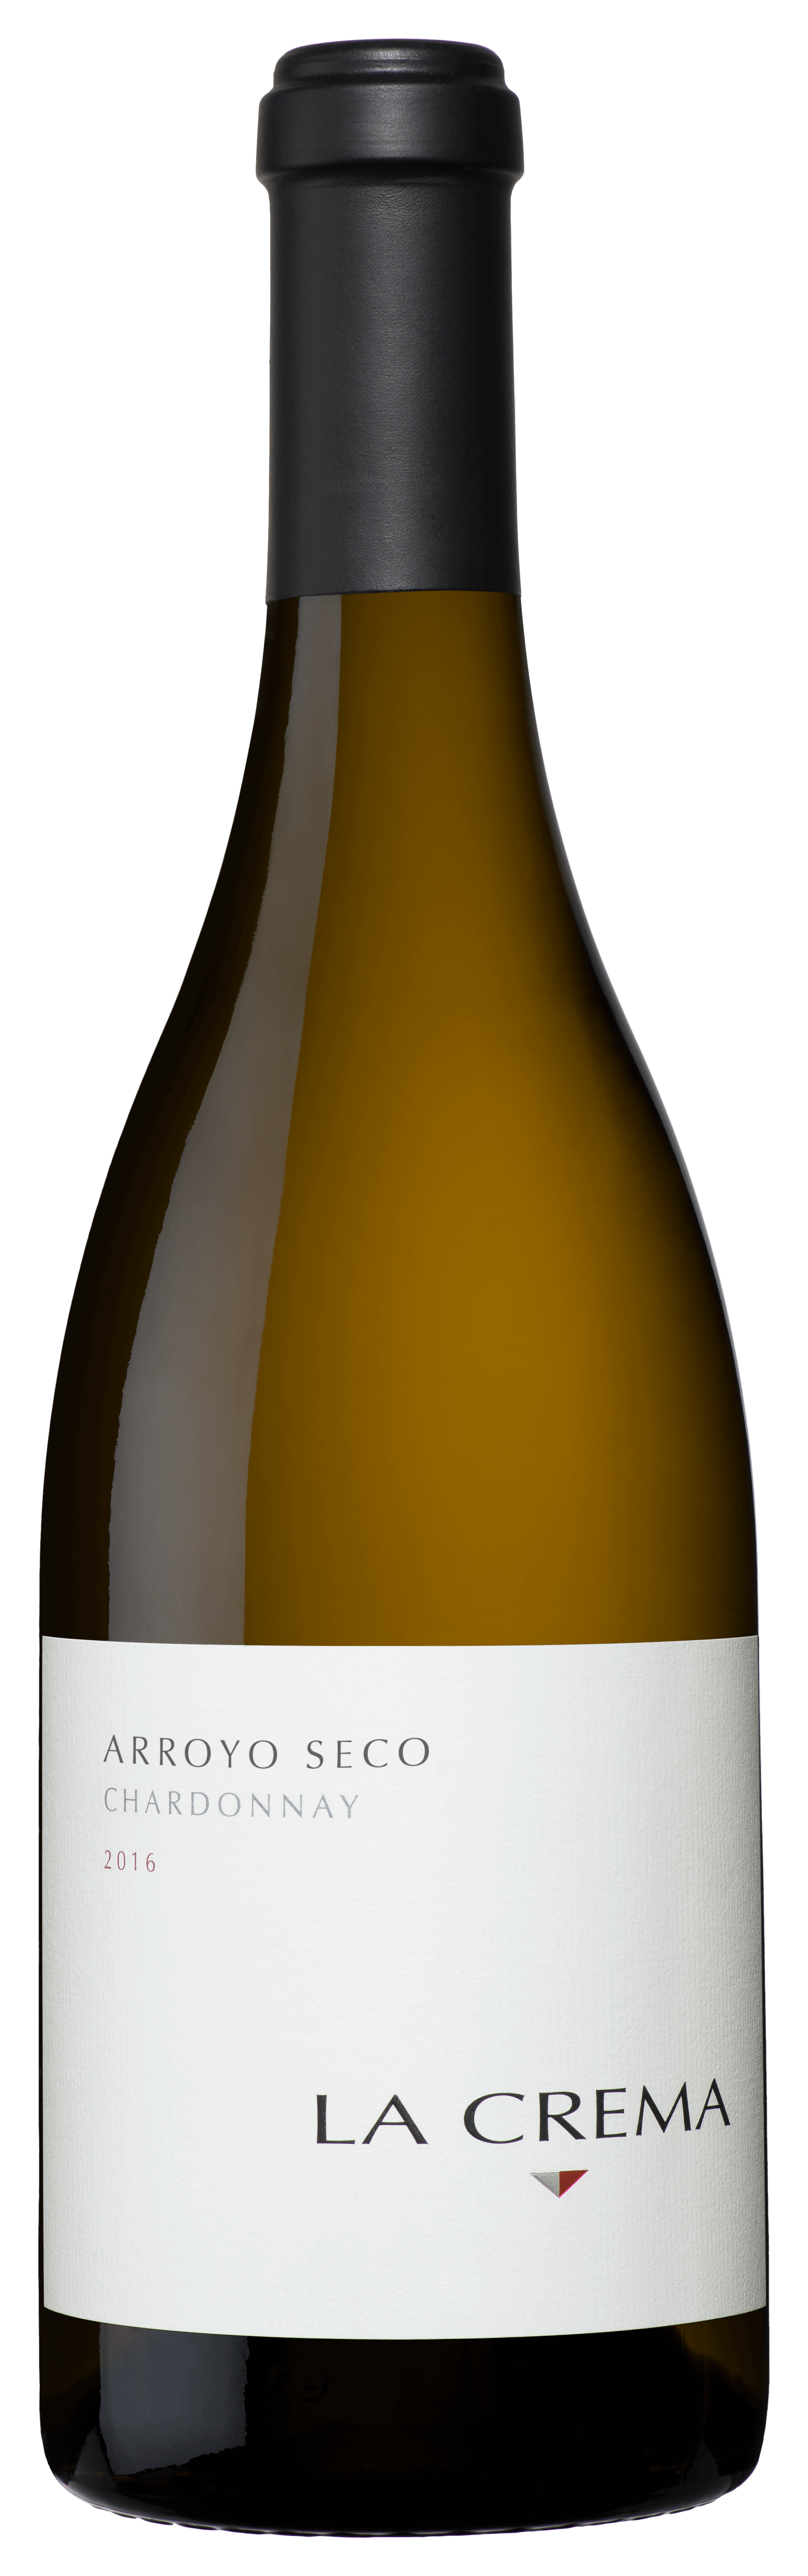 2016 Arroyo Seco Chardonnay